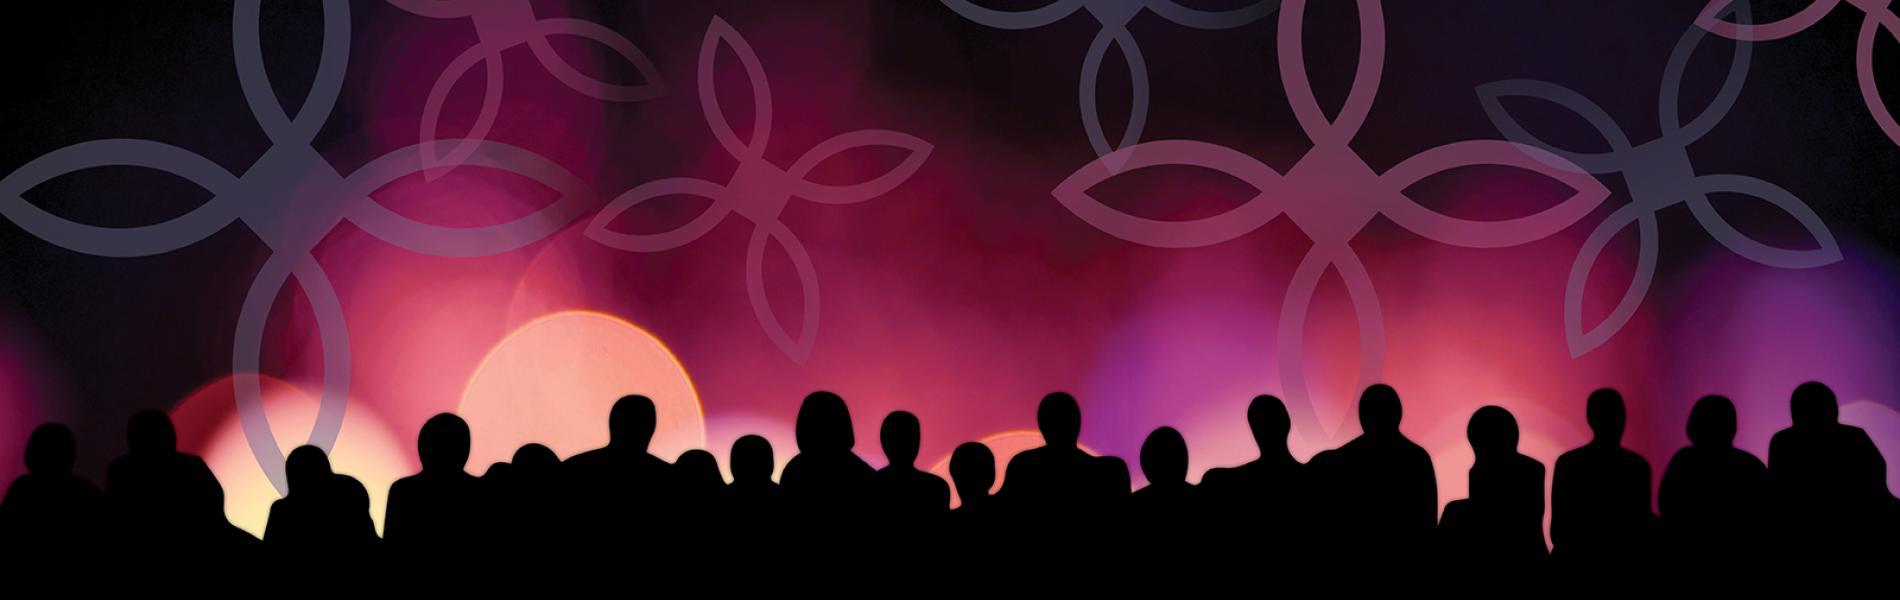 Who Hijacked My Fairy Tale? - Comedian Kelly Swanson